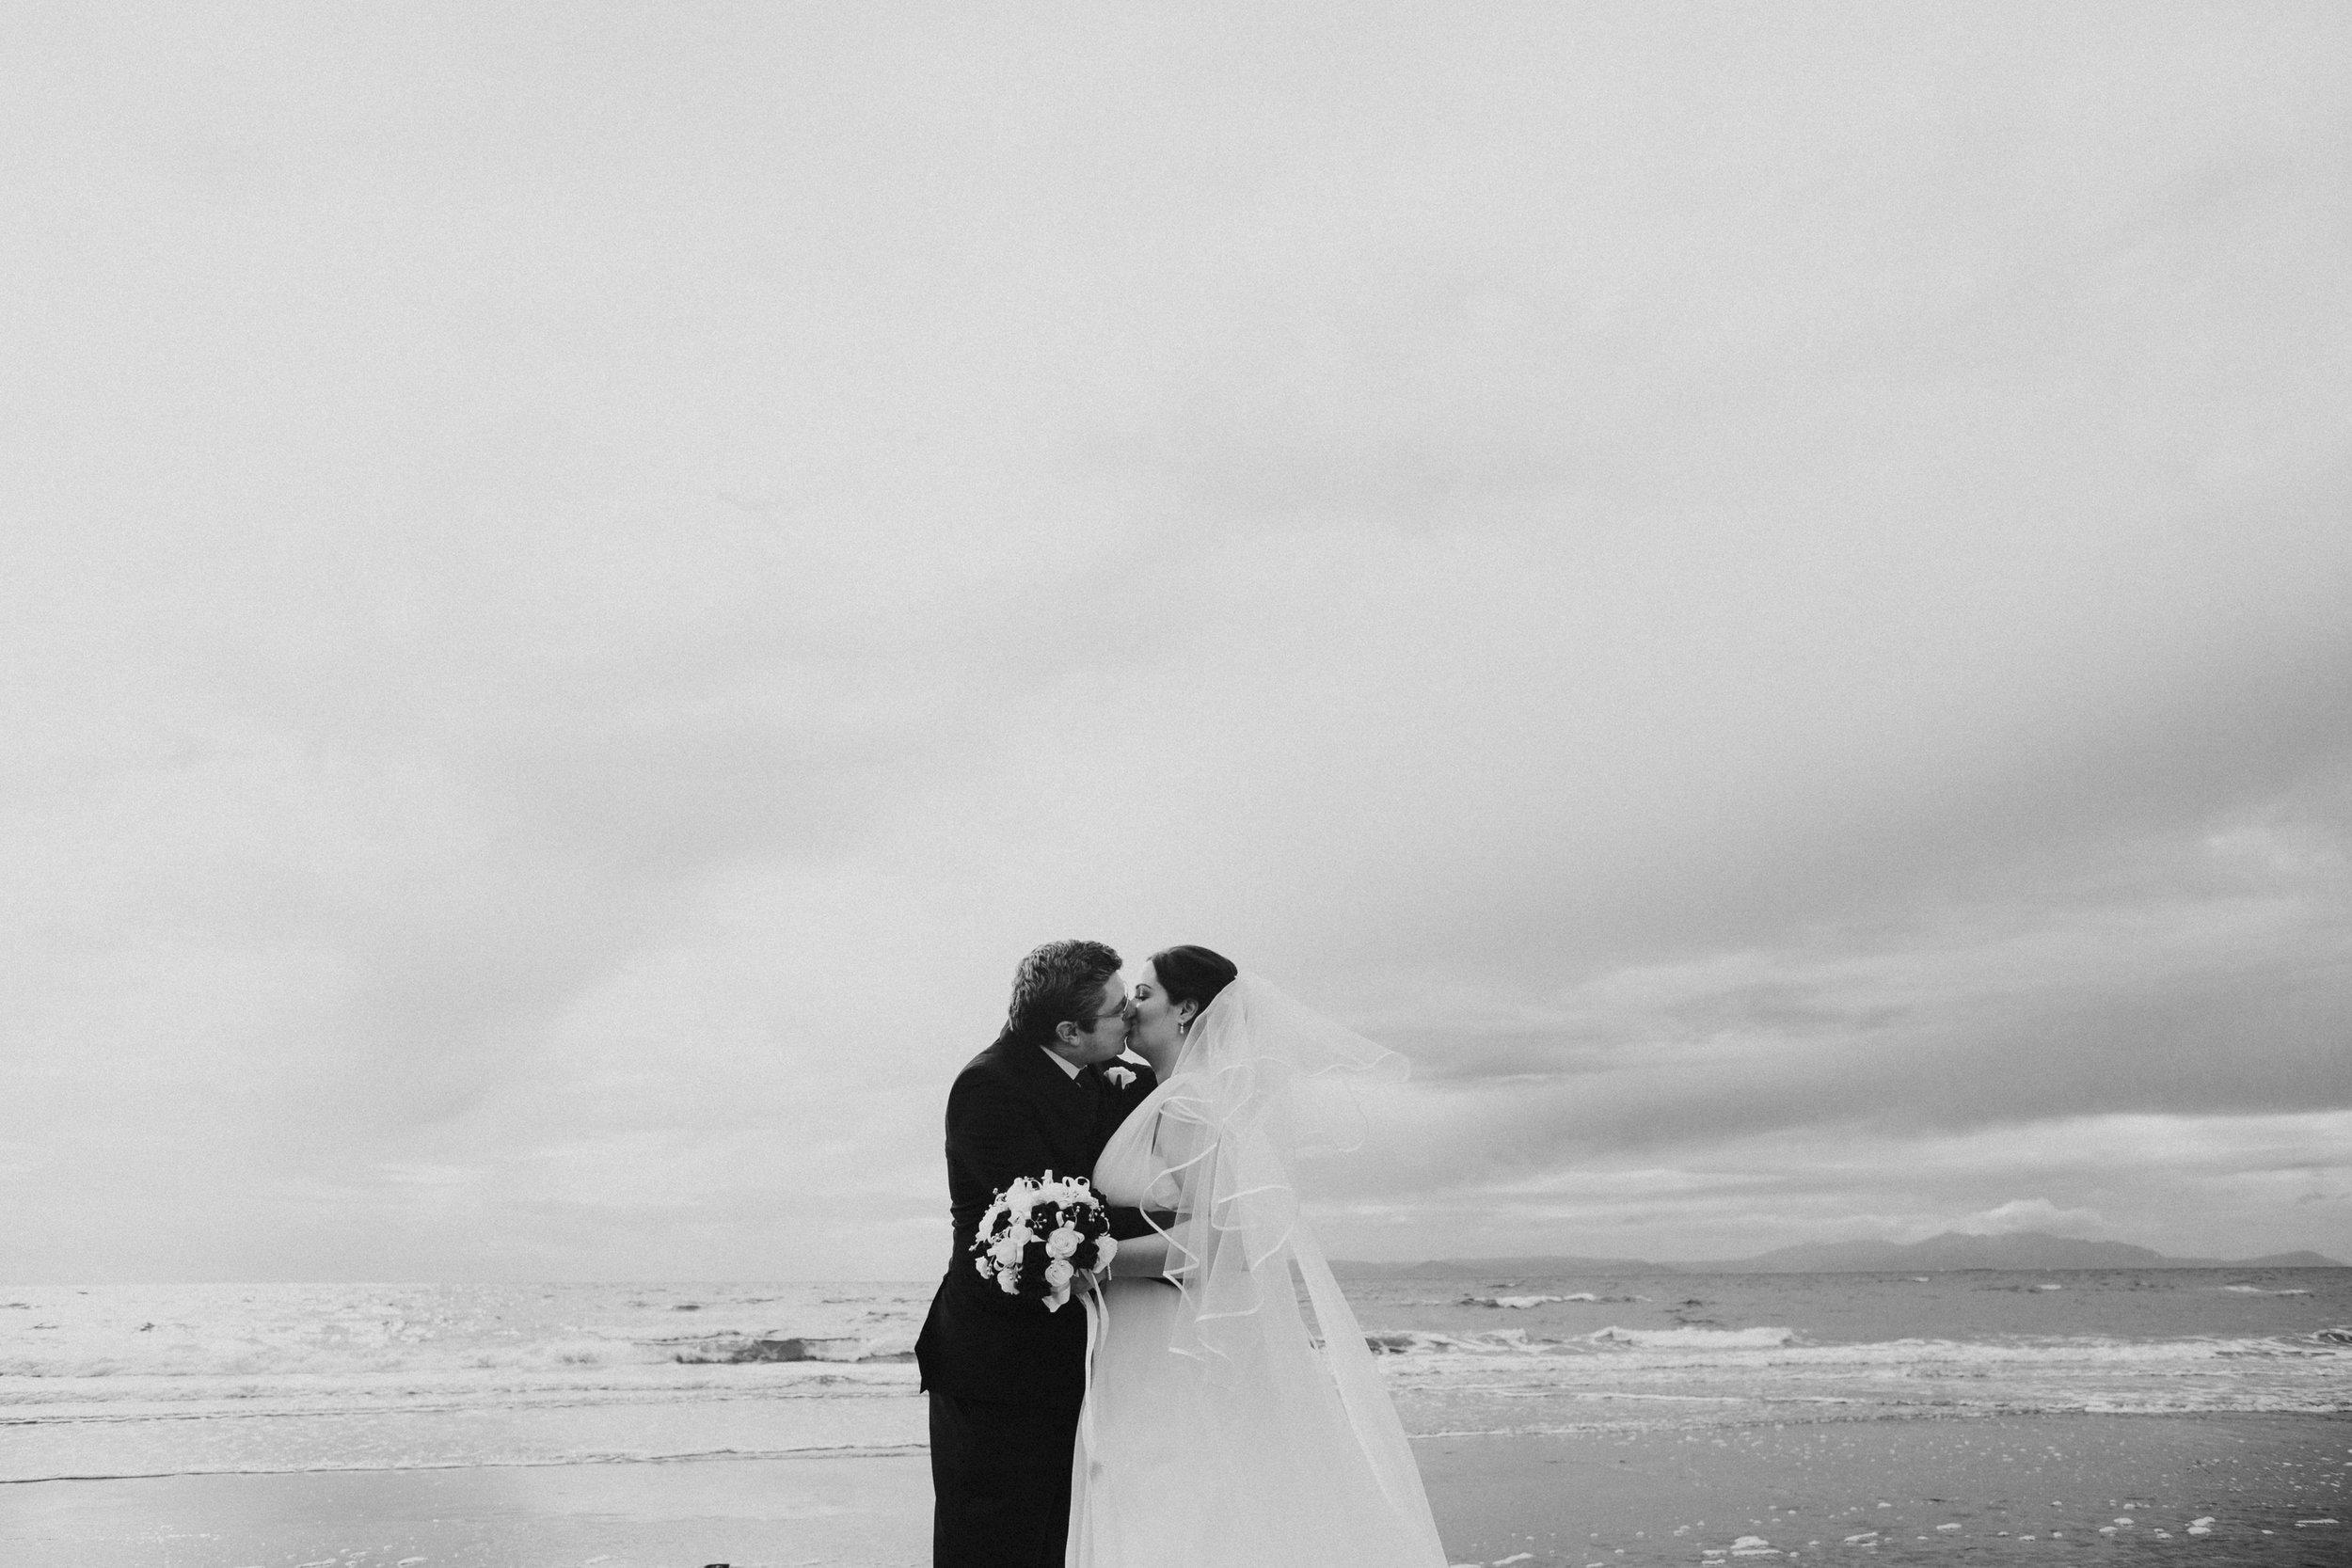 The best wedding photographer Prestwick